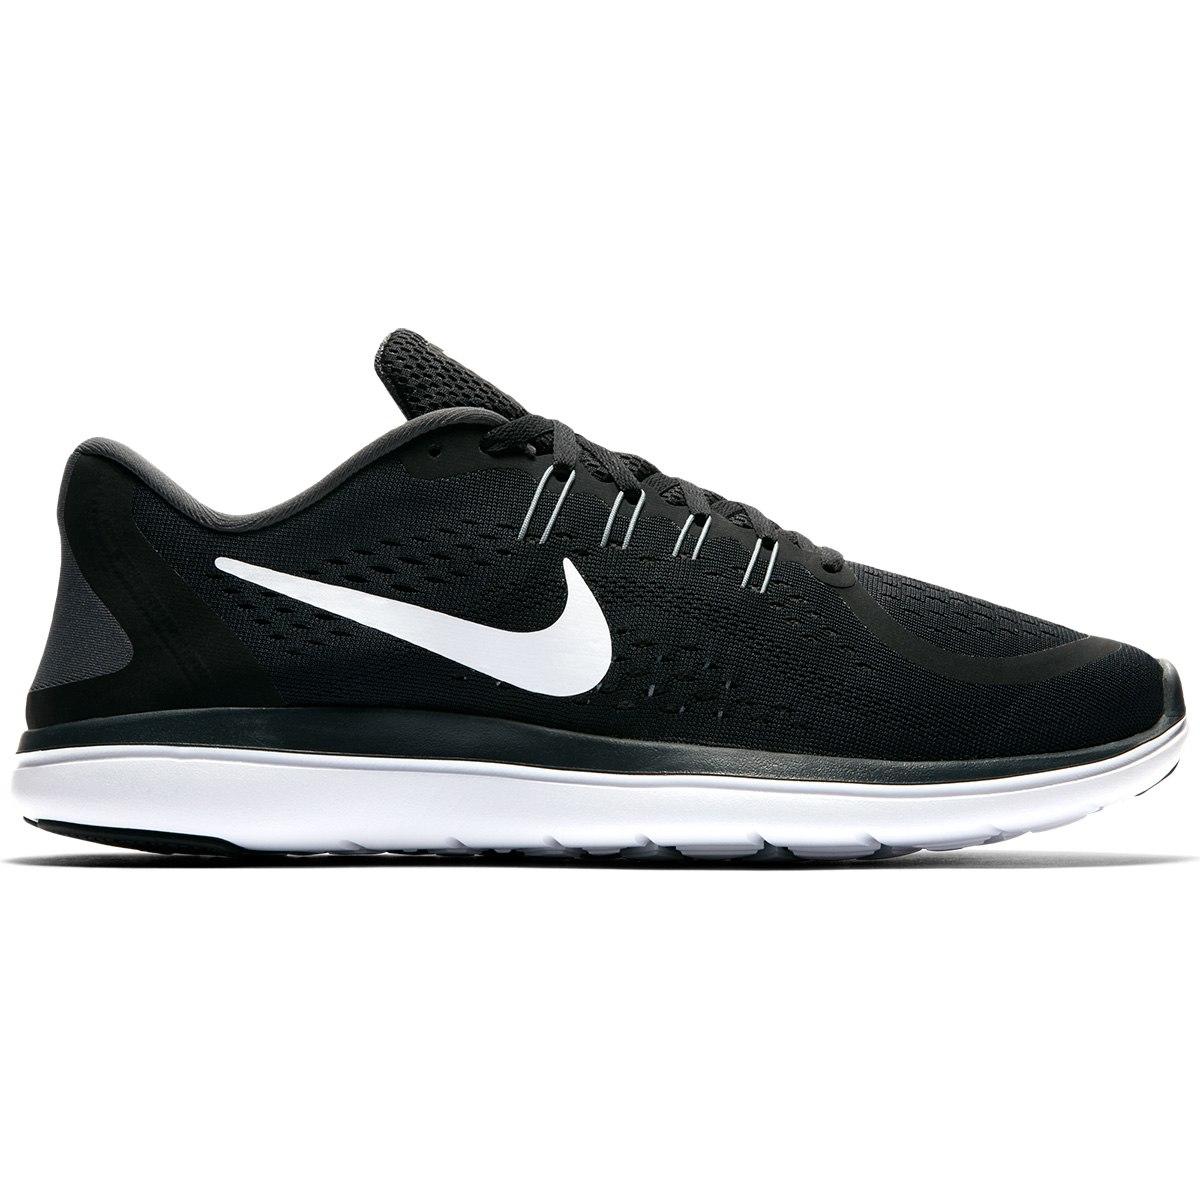 15e253e19f413 Tênis Nike Lunarcharge Essential Masculino